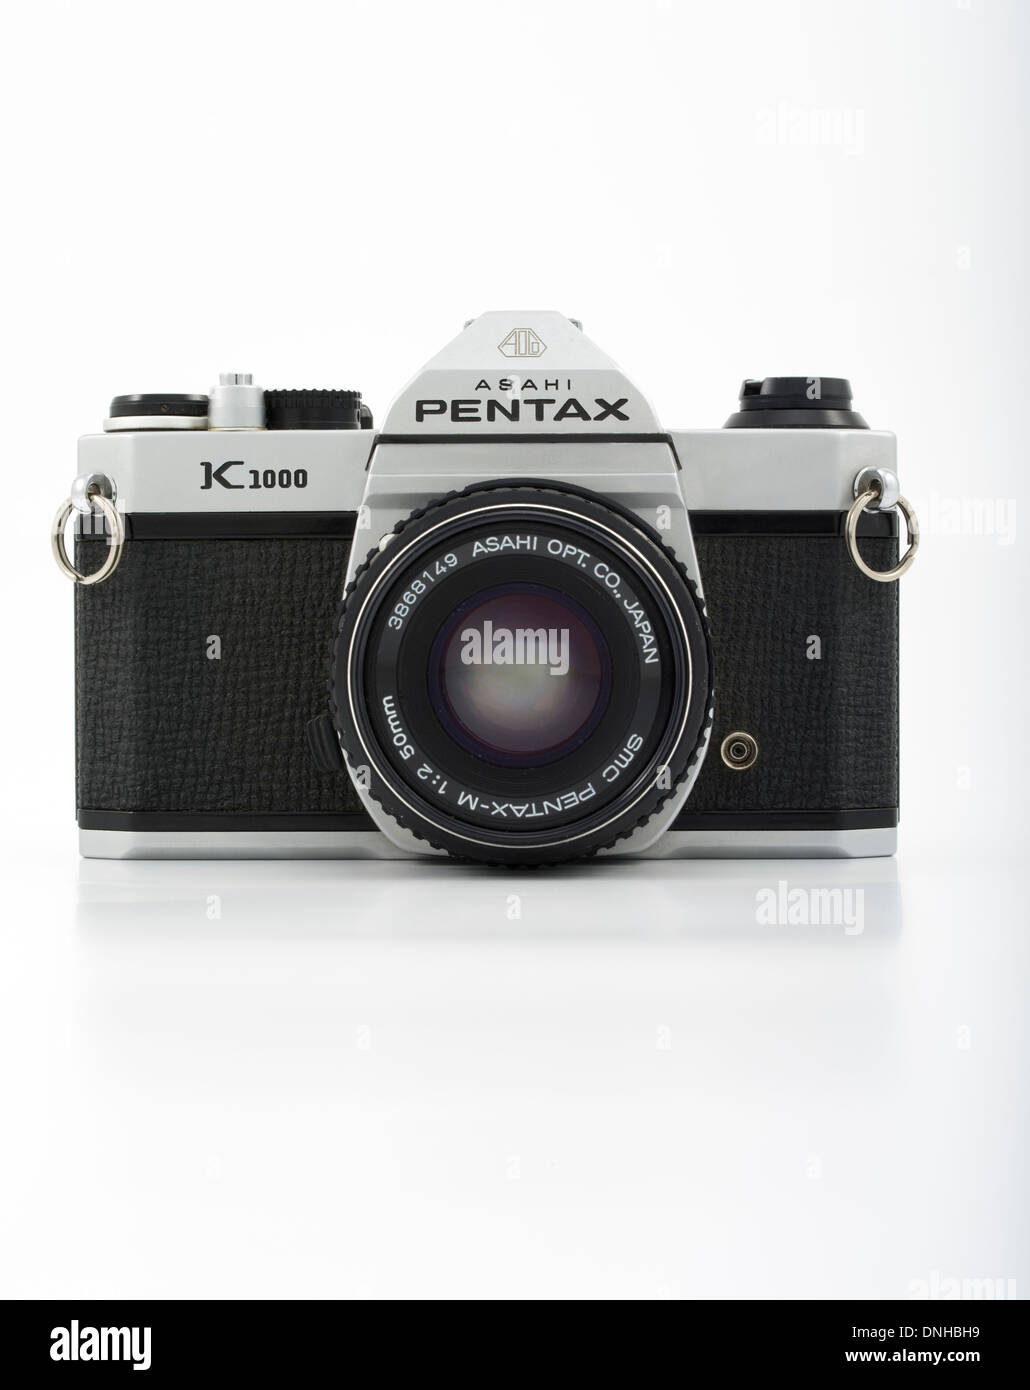 Asahi Pentax K1000 35mm SLR film camera. 1976 Made in Japan Asahi Optical Co., Ltd. - Stock Image